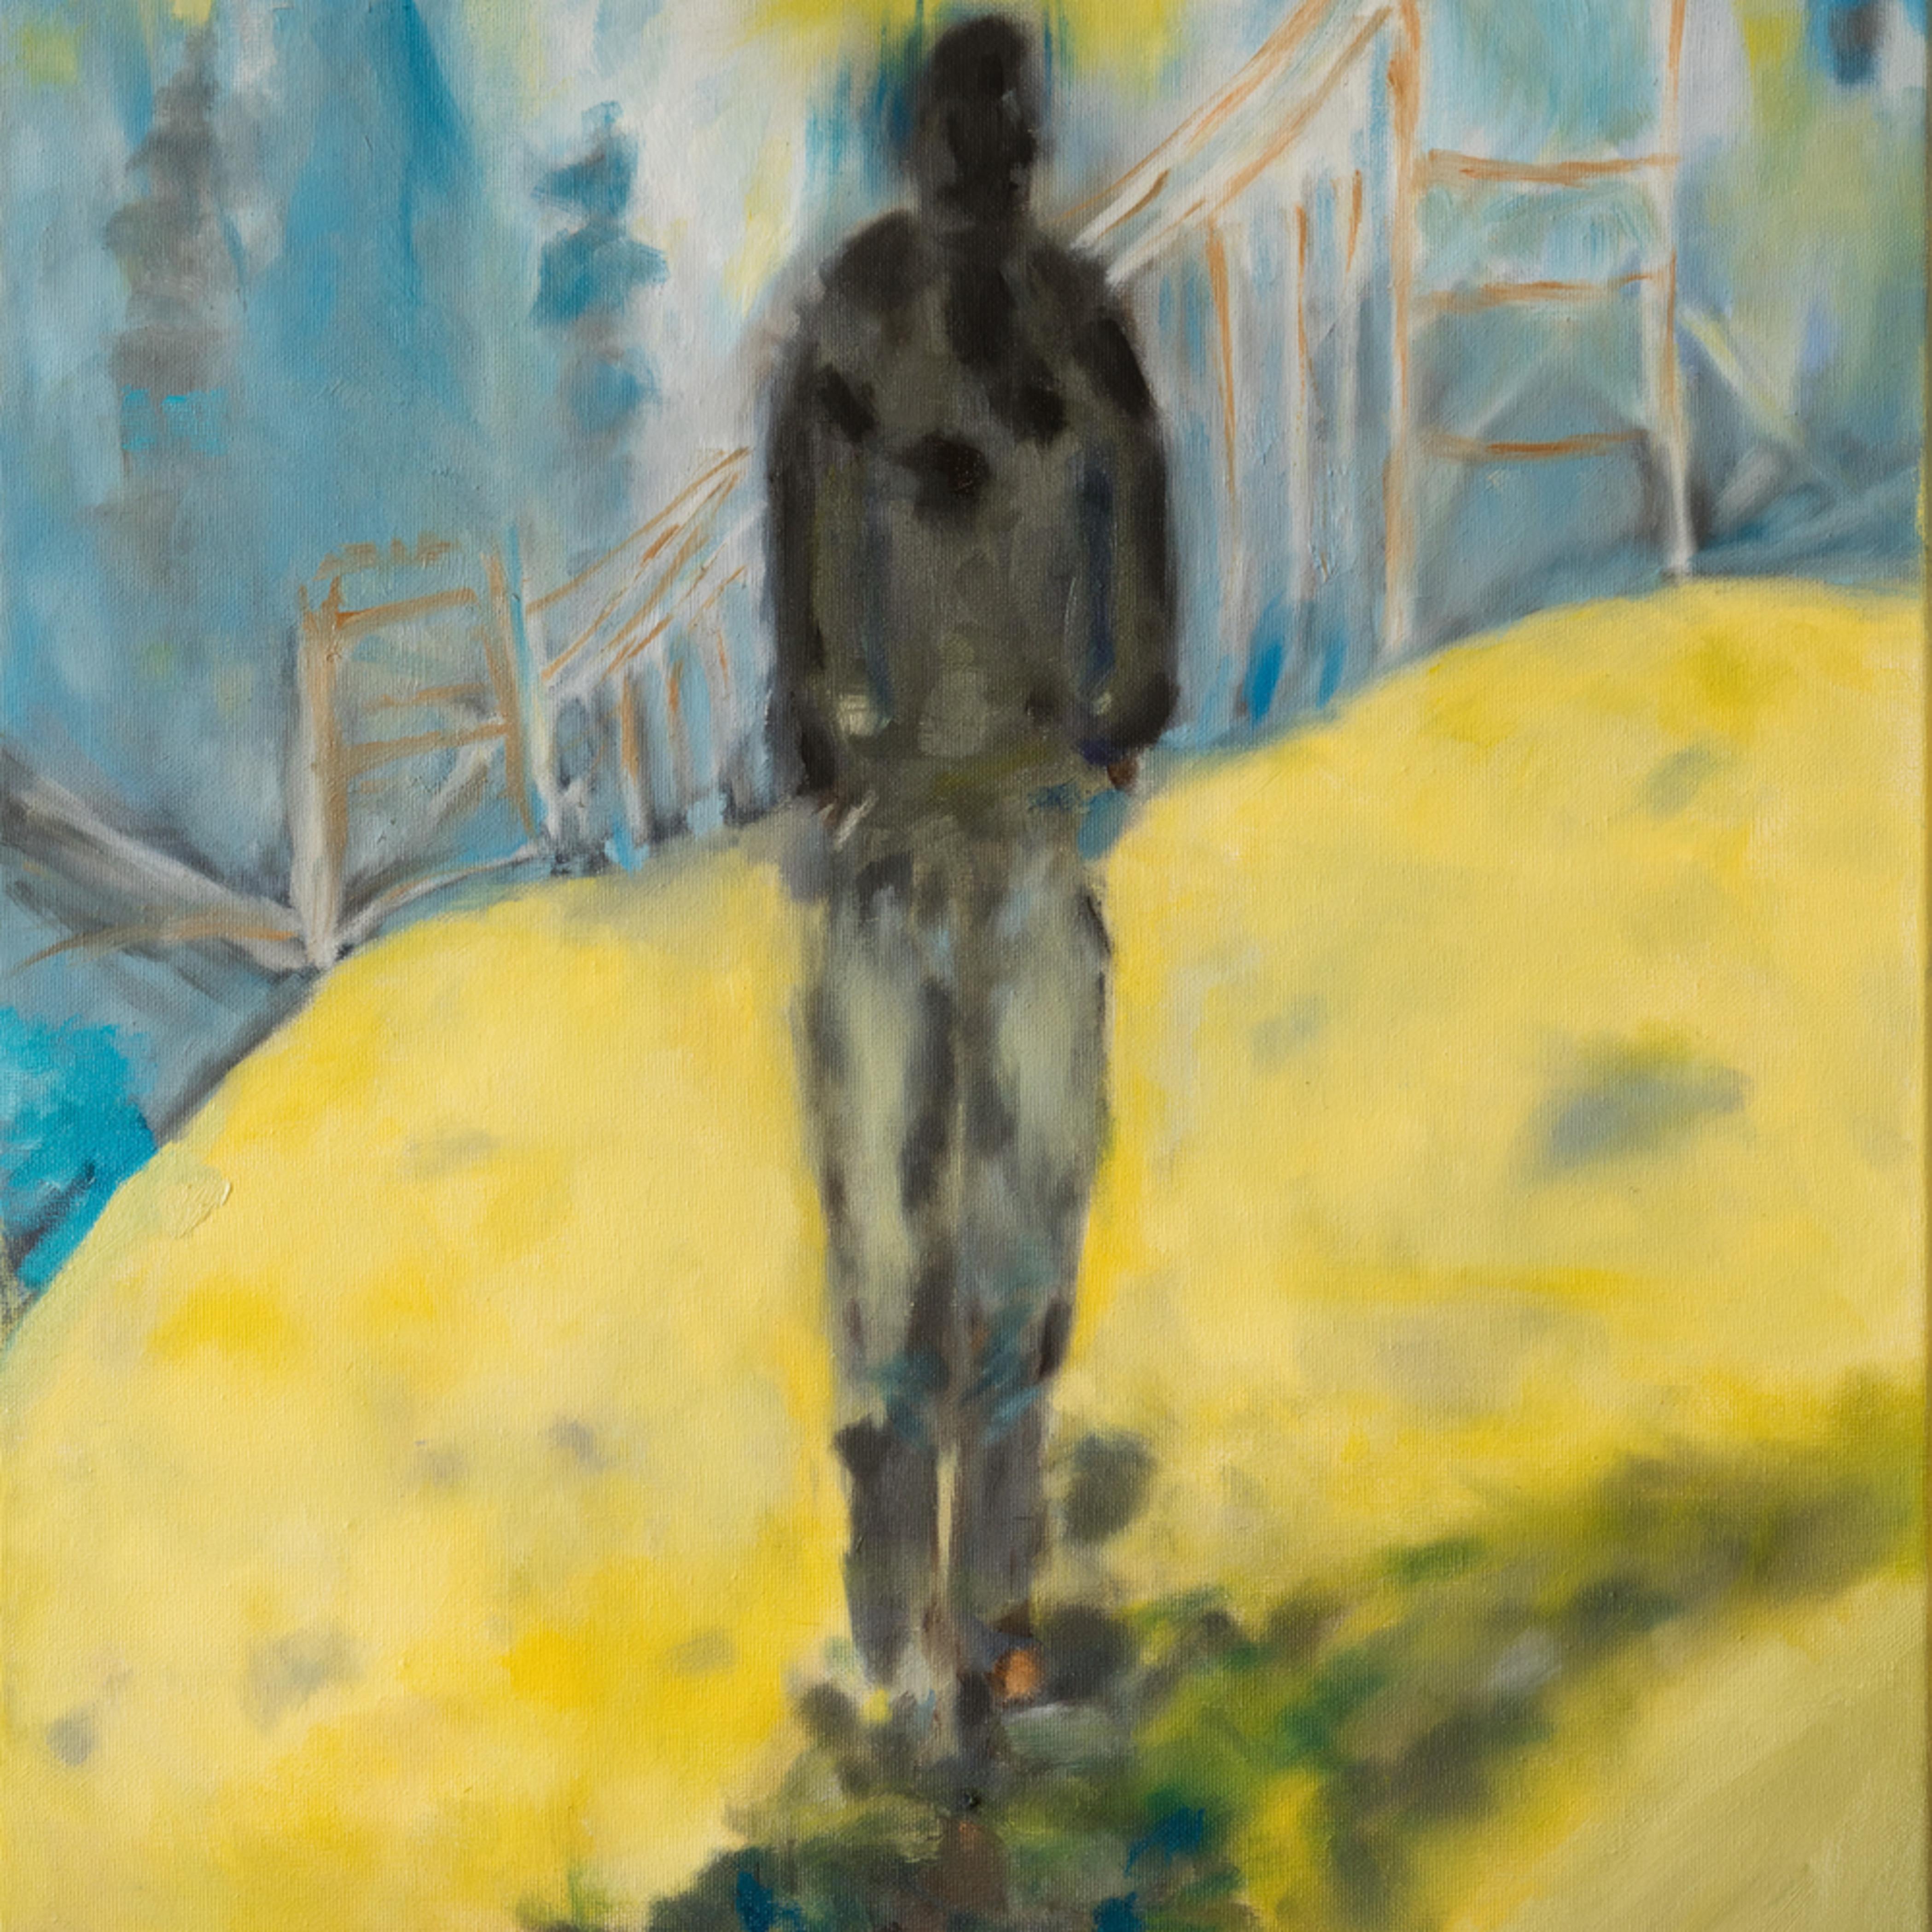 Man walking away from the bridge  ane howard paintings 08 zgae3b